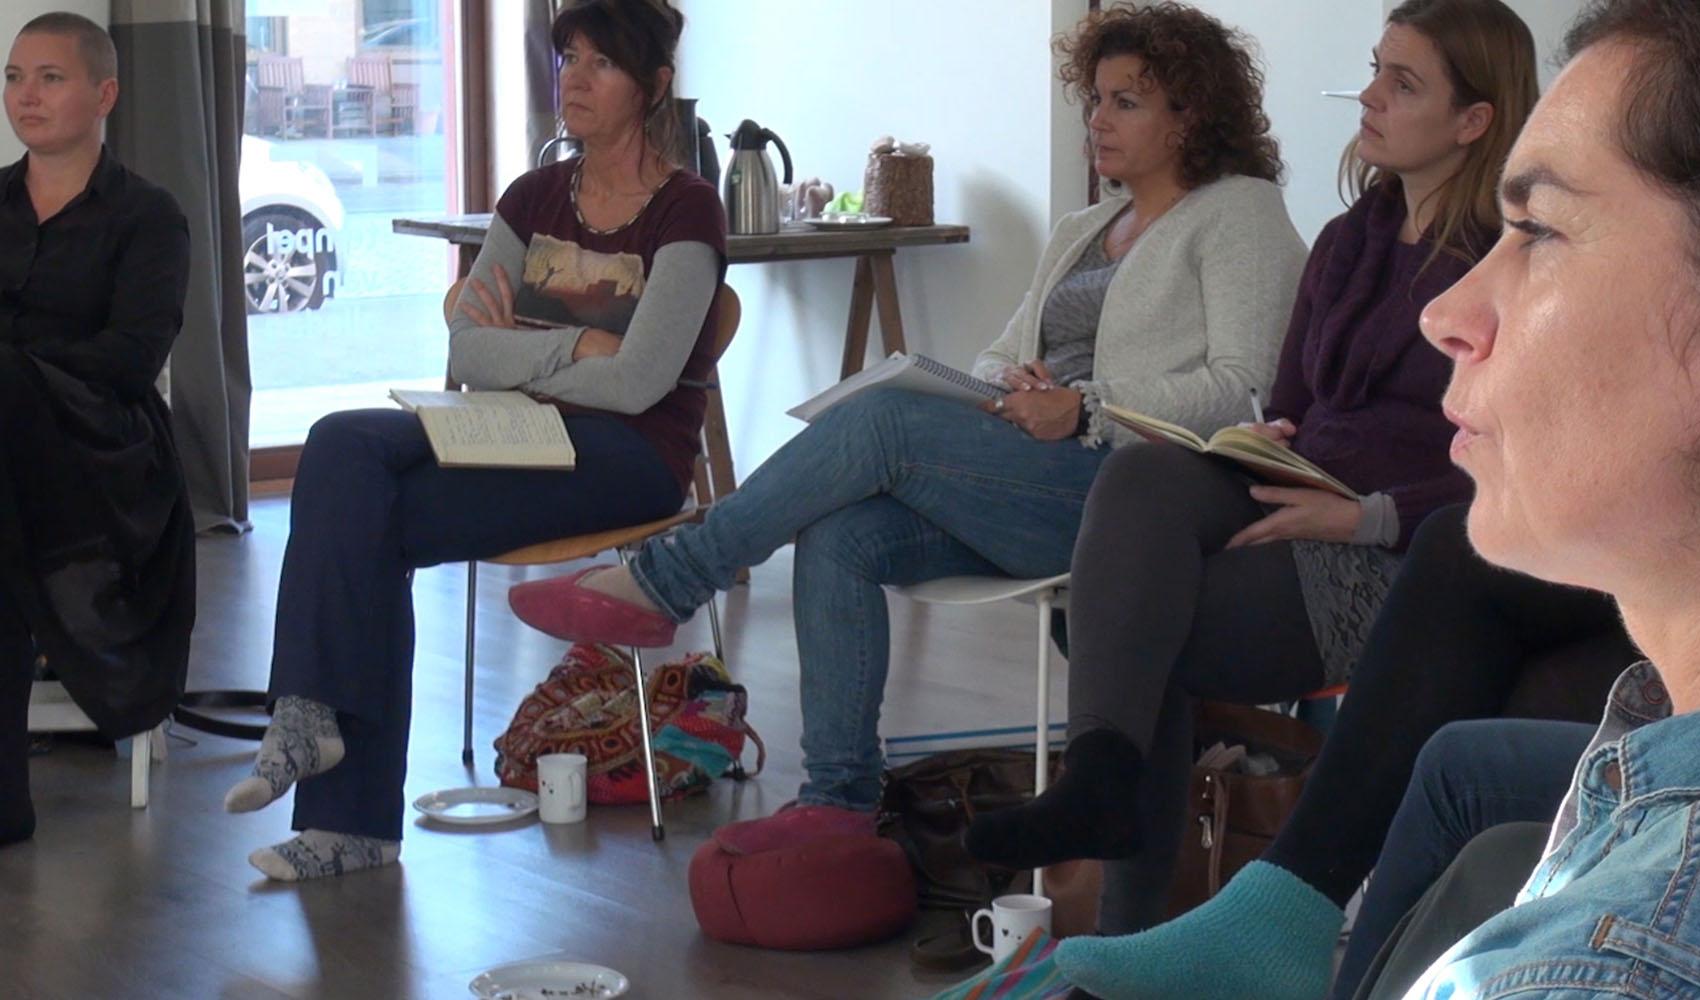 anurag-inspiratiebijeenkomst-_0007_1 0 mindfulnesstrainingen 13,5X9 Still 9-10 kopie